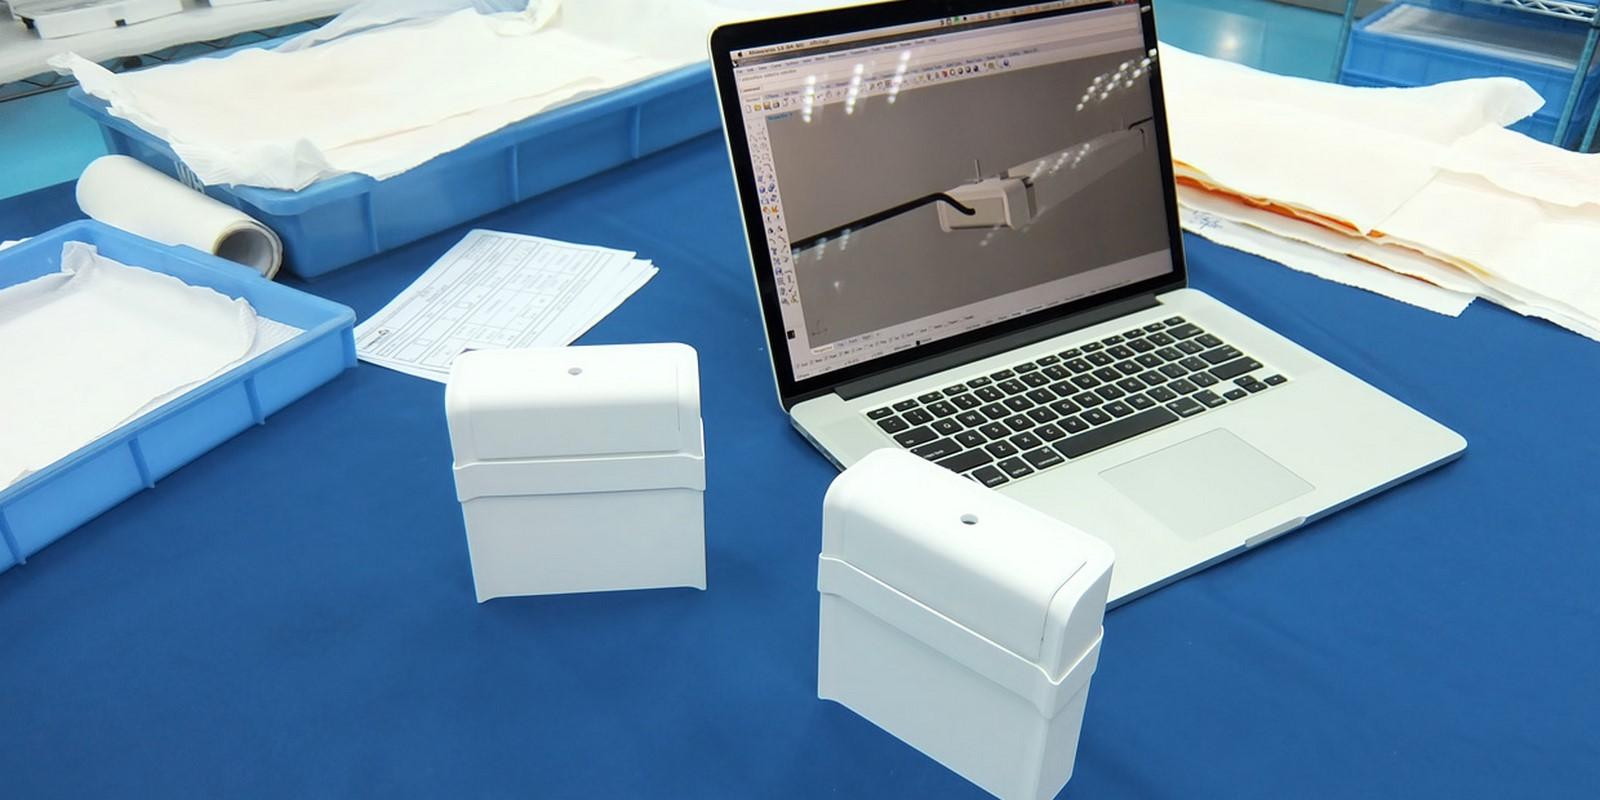 Sequoia-studio- 10 Iconic Products - Sheet18